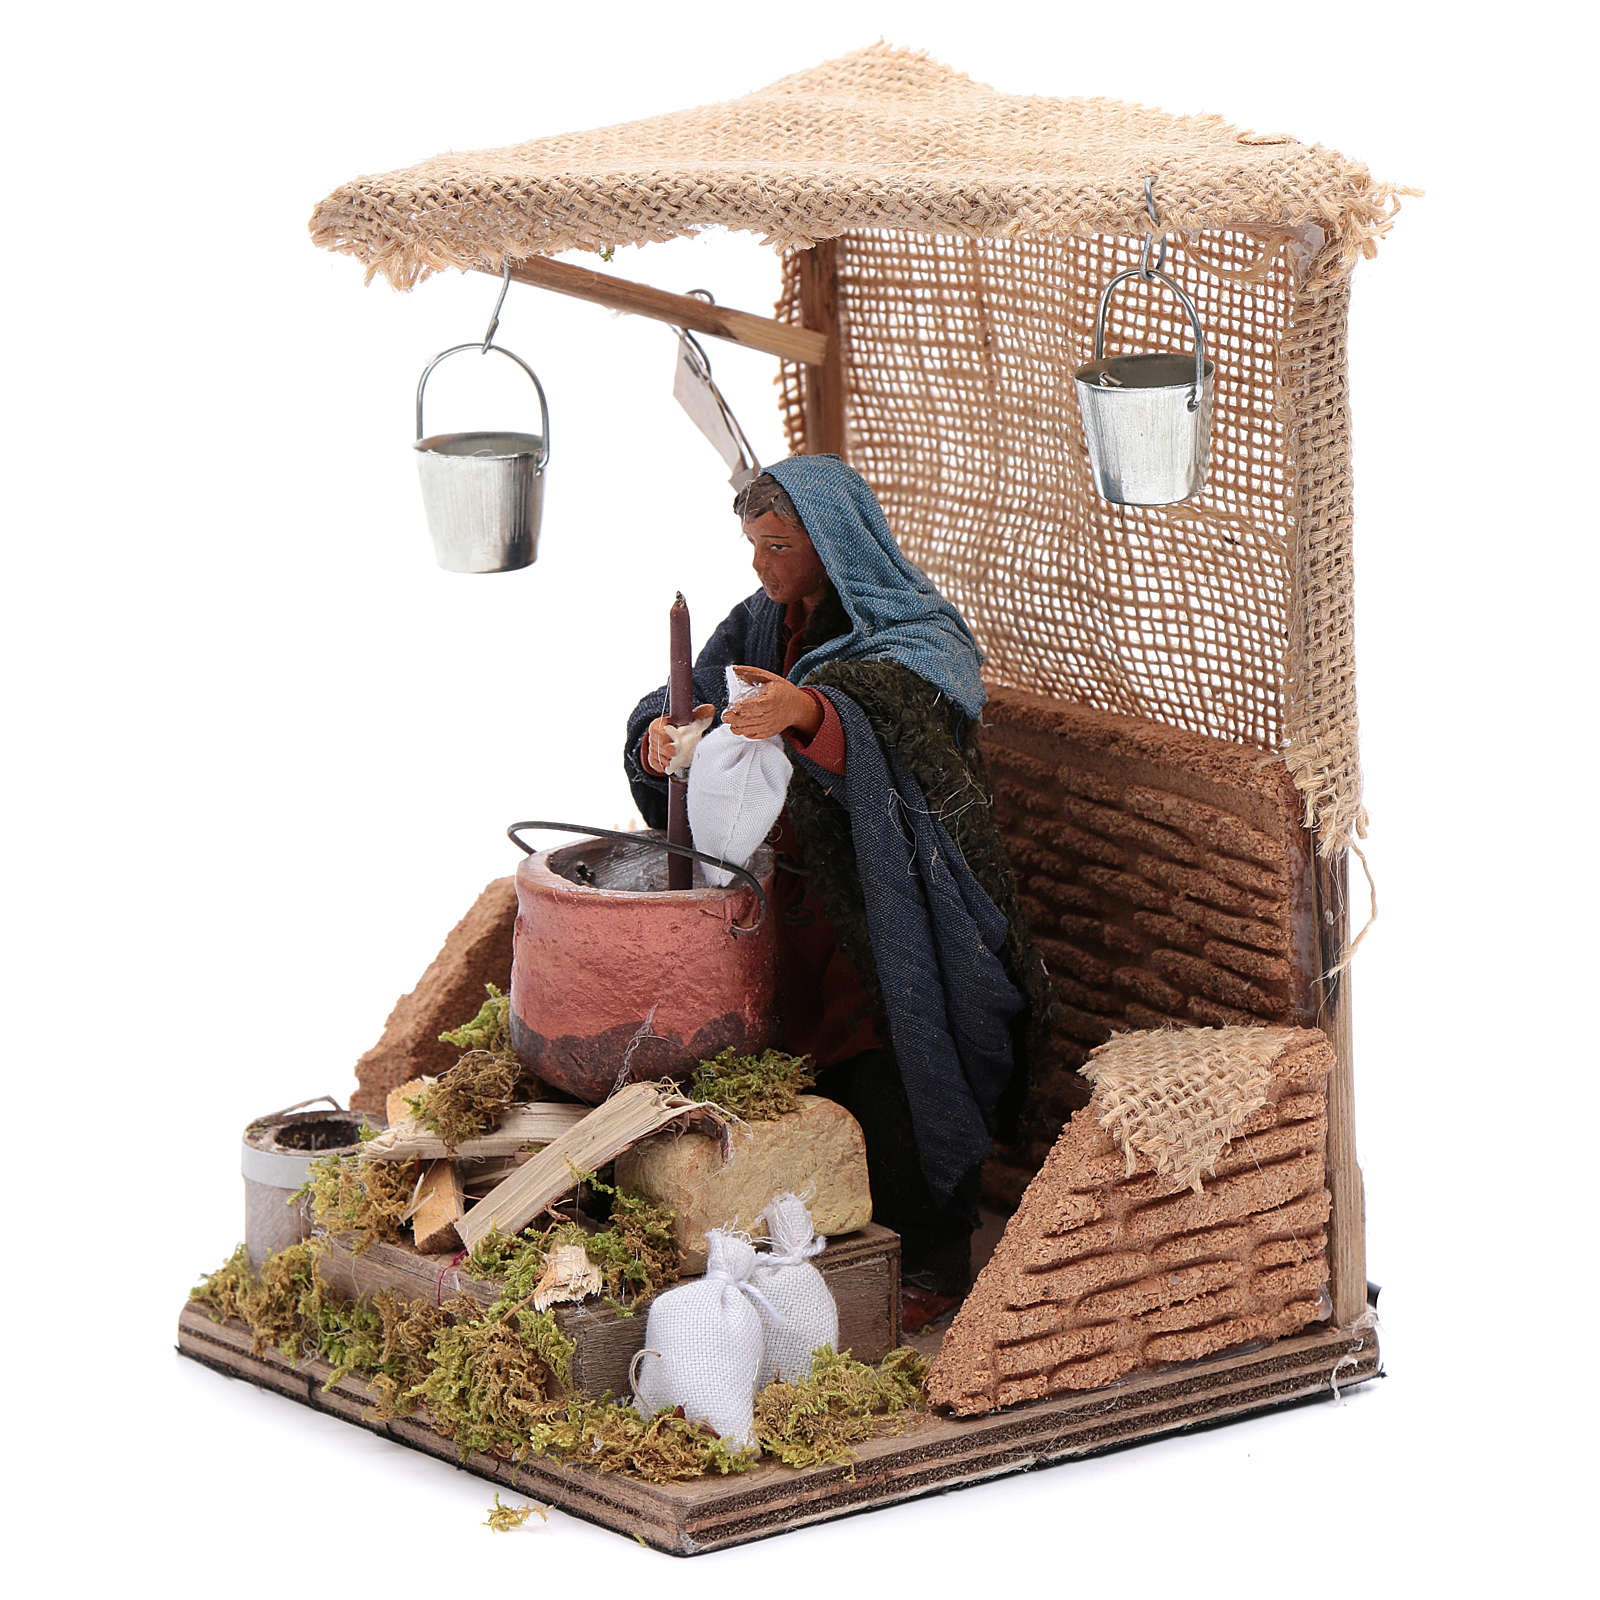 Man baking polenta 12cm Neapolitan Nativity animated figurine 4